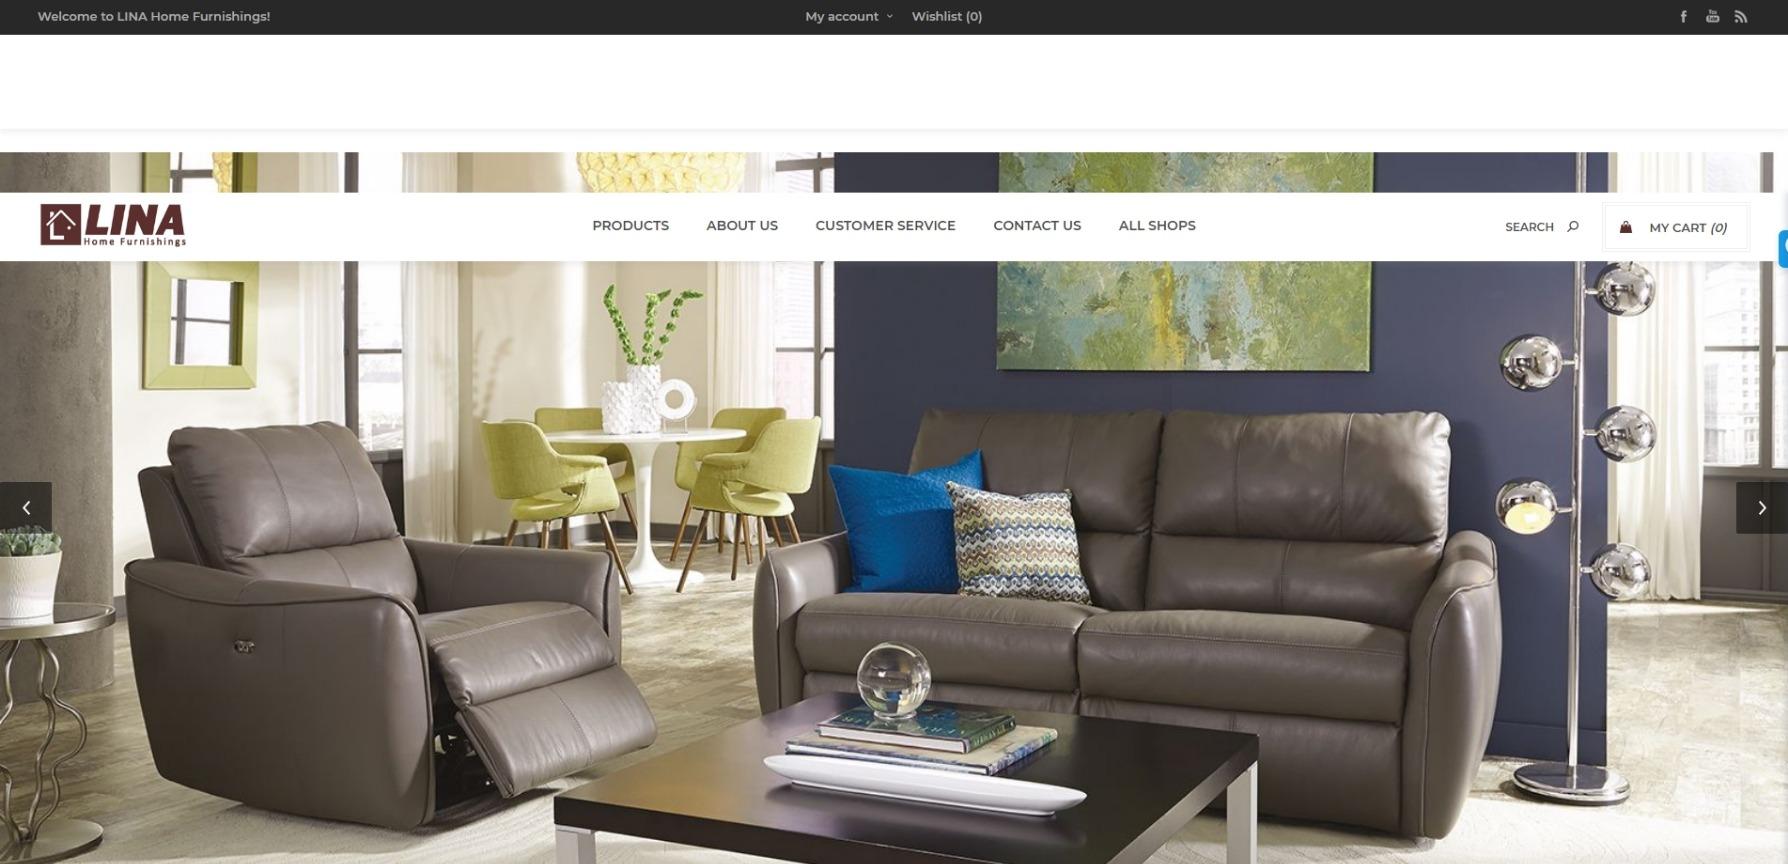 Lina Home Furnishings - Avondale, AZ.